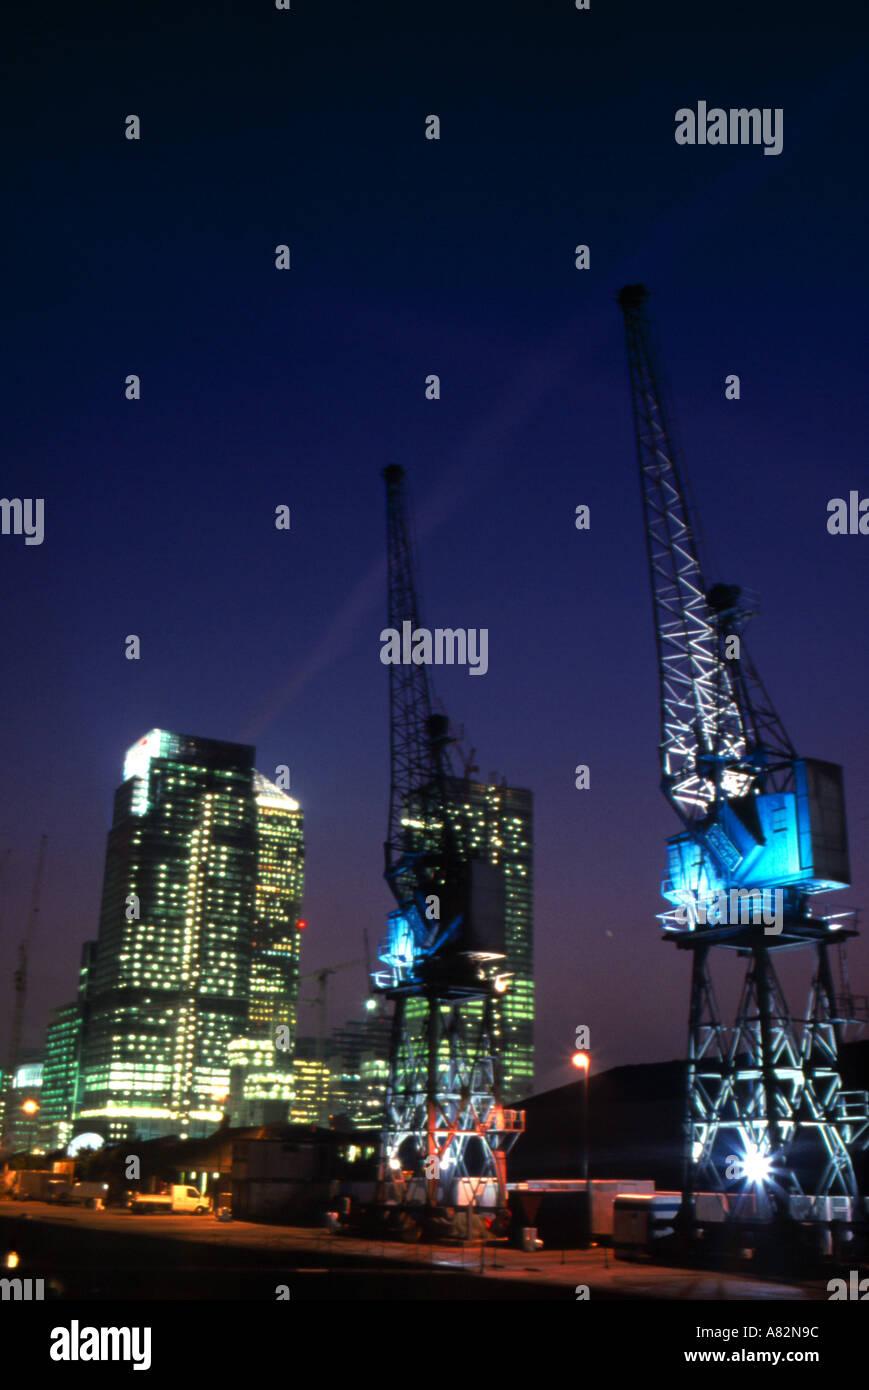 Cranes Docklands London - Stock Image